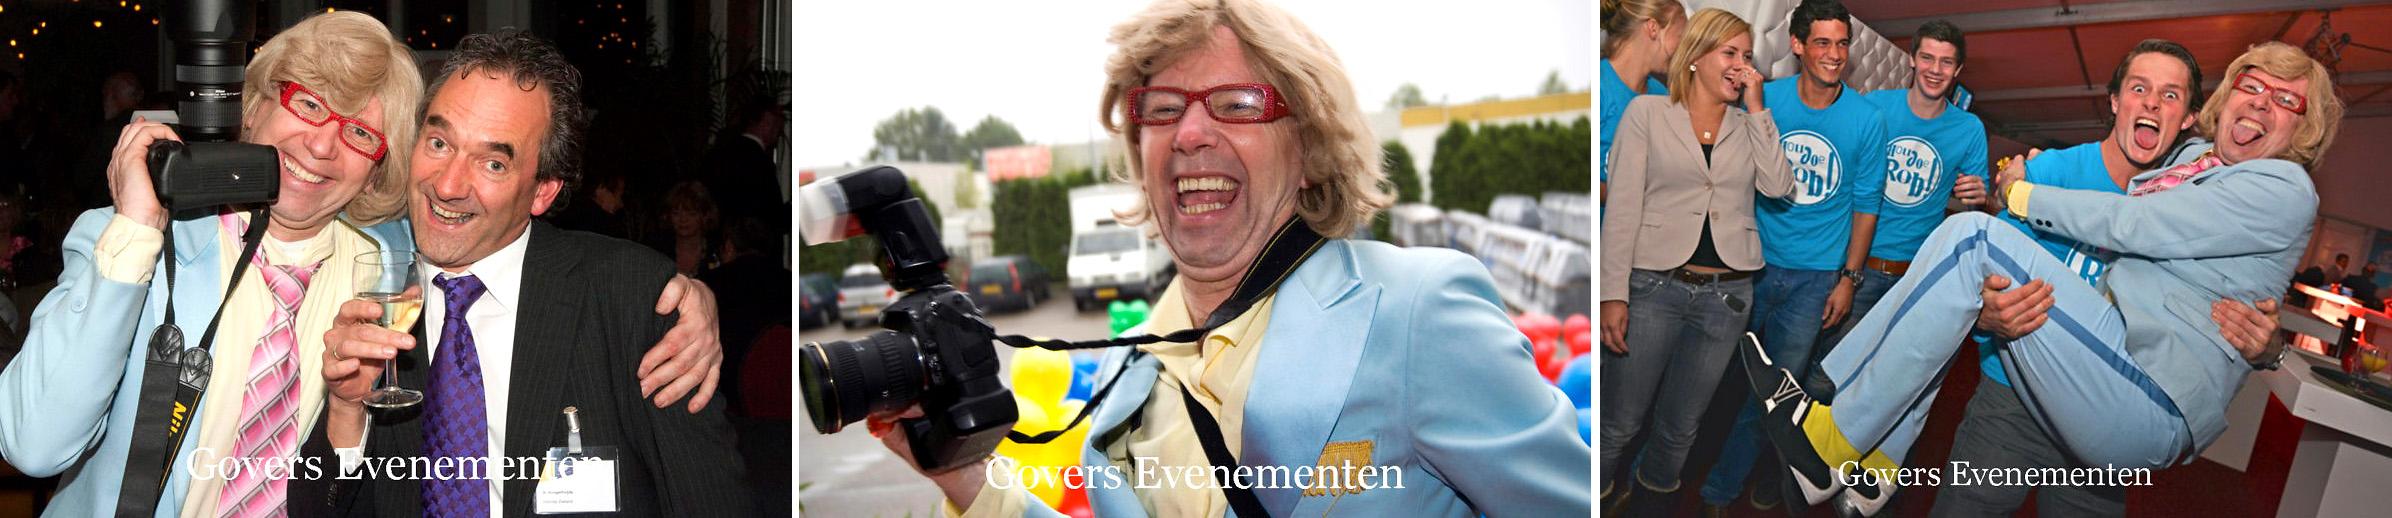 Paparazzi fotografen, Govers Evenementen, DE PAPARAZZI FOTOGRAAF is te vinden via; DE PAPARAZZI FOTOGRAAF regelen, DE PAPARAZZI FOTOGRAAF arrangeren, DE PAPARAZZI FOTOGRAAF huren, DE PAPARAZZI FOTOGRAAF boeken, DE PAPARAZZI FOTOGRAAF informatie, DE PAPARAZZI FOTOGRAAF biografie, DE PAPARAZZI FOTOGRAAF boekingsburo, DE PAPARAZZI FOTOGRAAF boekingsbureau, DE PAPARAZZI FOTOGRAAF artiestenbureau, DE PAPARAZZI FOTOGRAAF prijzen, DE PAPARAZZI FOTOGRAAF inhuren, DE PAPARAZZI FOTOGRAAF offerte, DE PAPARAZZI FOTOGRAAF bookings, DE PAPARAZZI FOTOGRAAF boekingskantoor, DE PAPARAZZI FOTOGRAAF boekingen, DE PAPARAZZI FOTOGRAAF, www.goversartiesten.nl